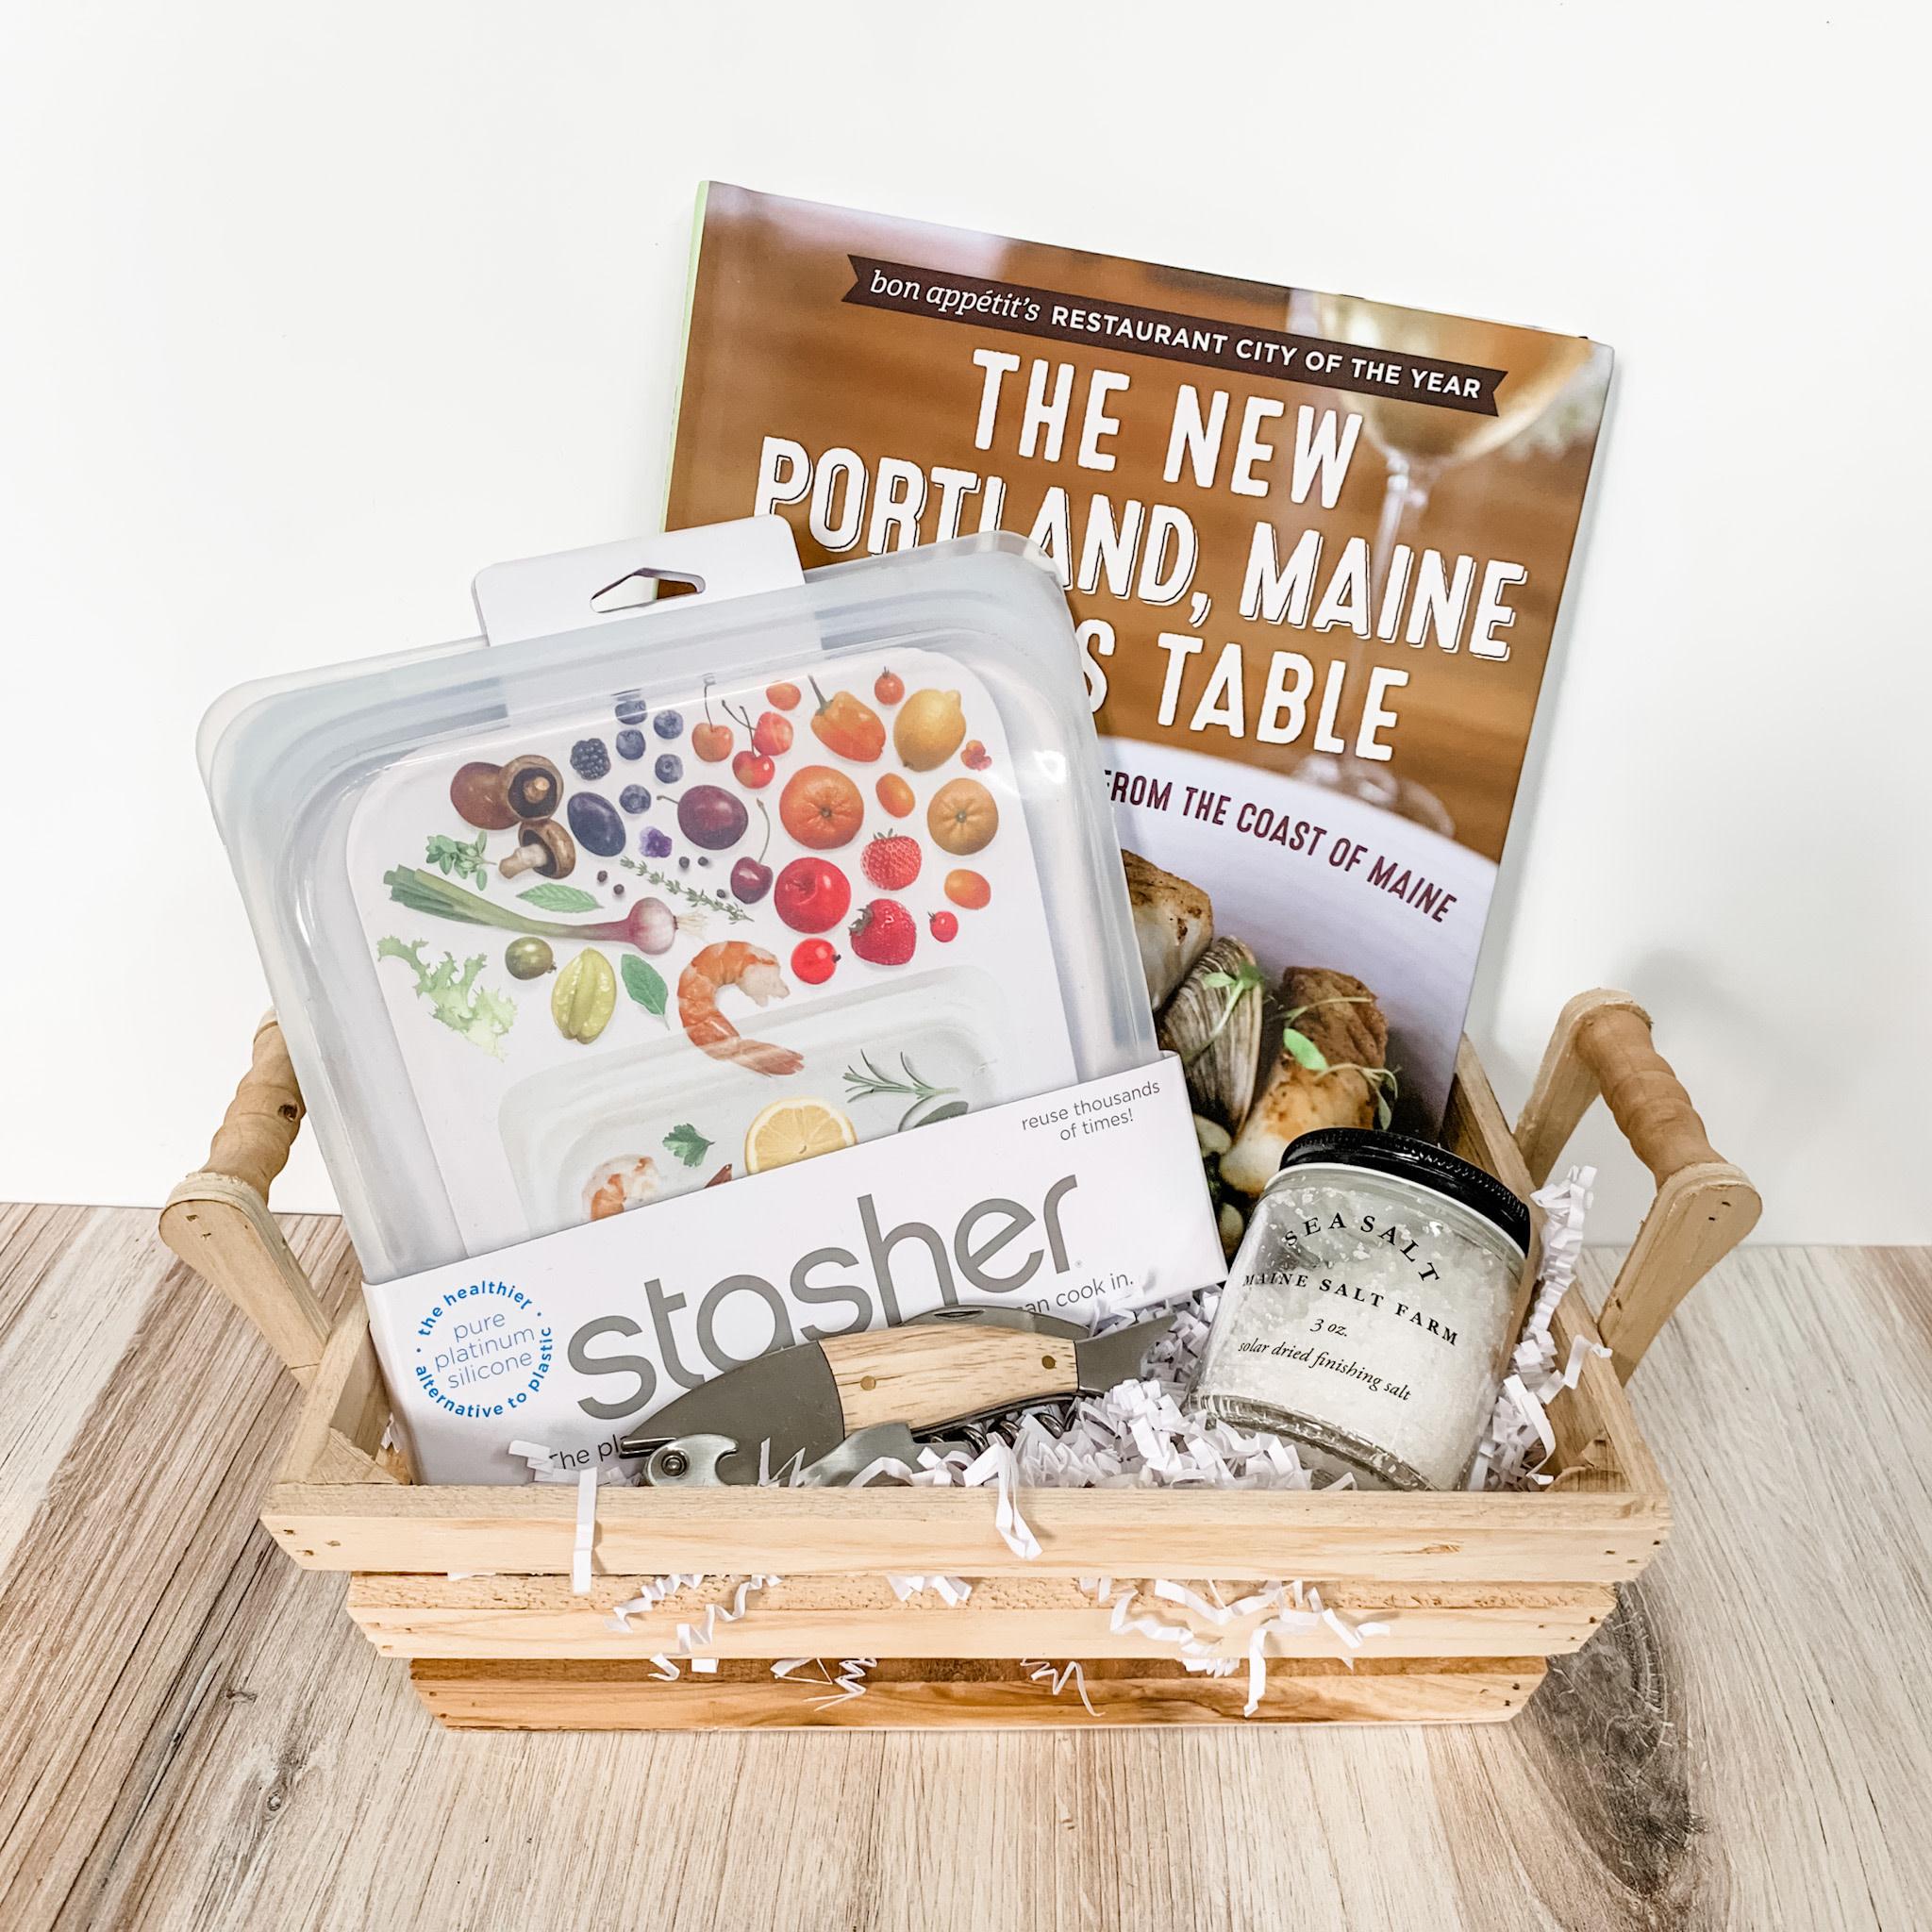 Daytrip Society Gift Basket - Chef's Table